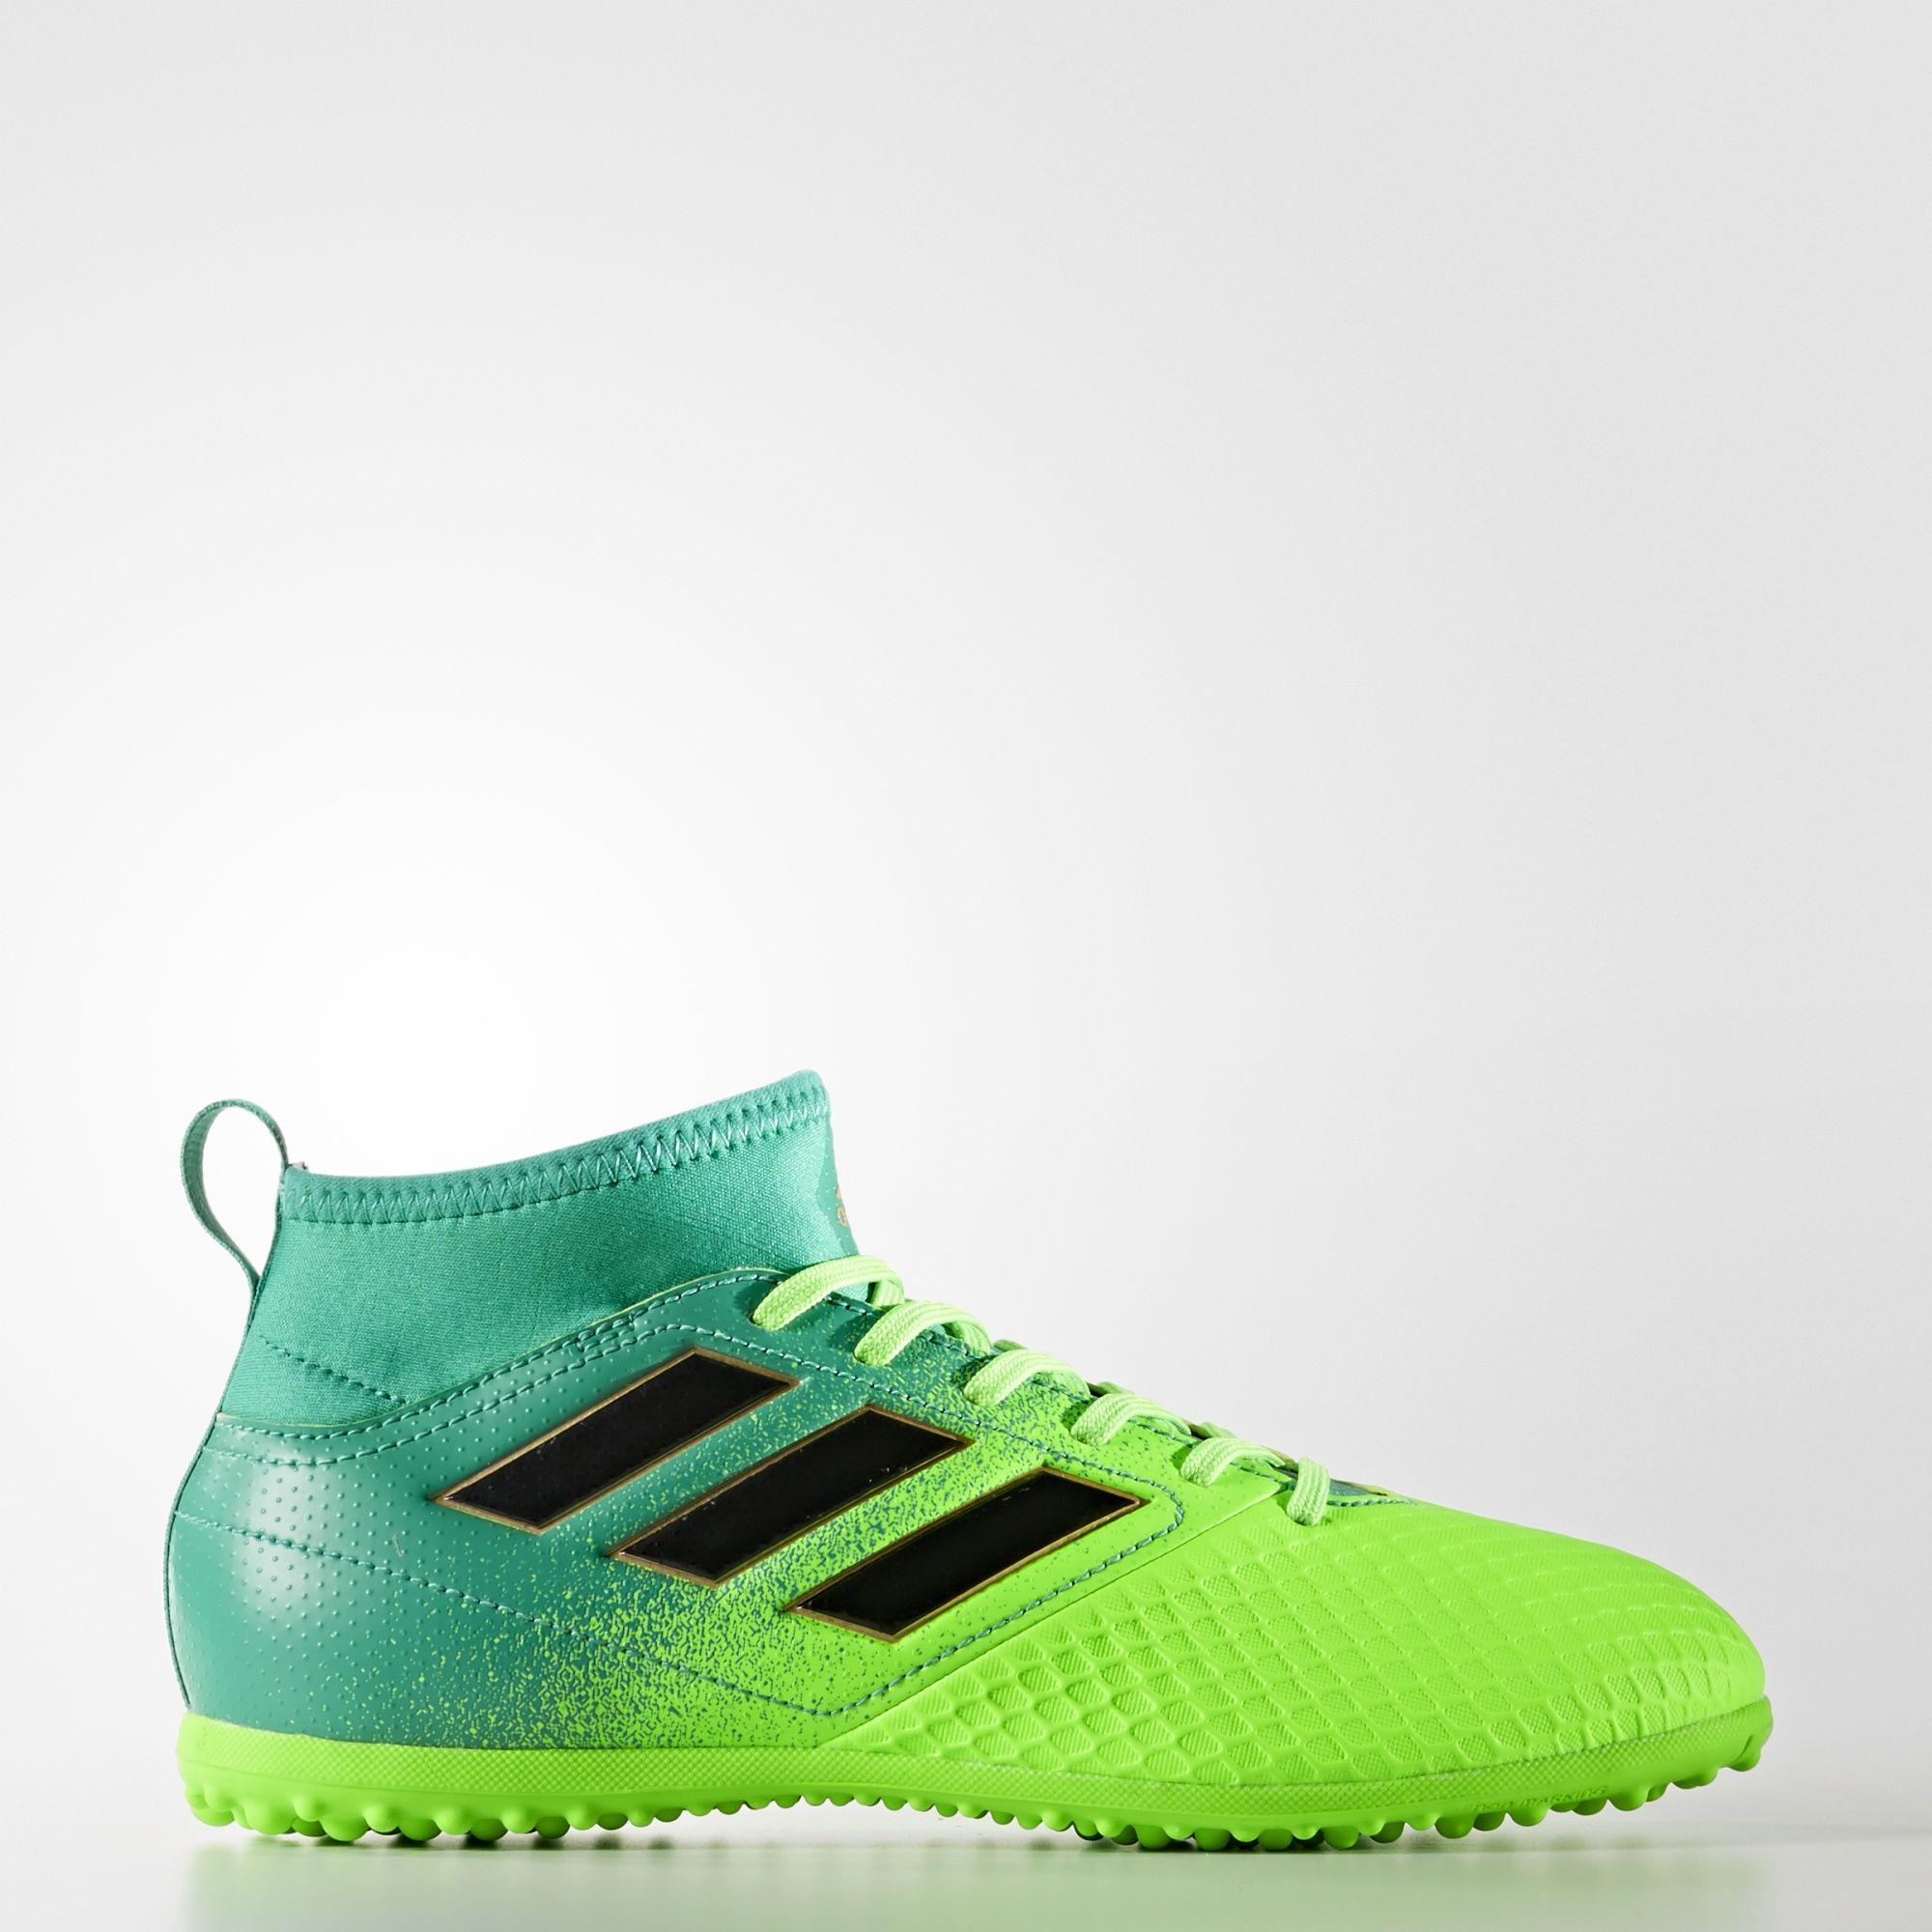 low priced f2e52 27b44 adidas-ACE-17-3-TF-Kinder-Fussballschuhe-Multinocken-